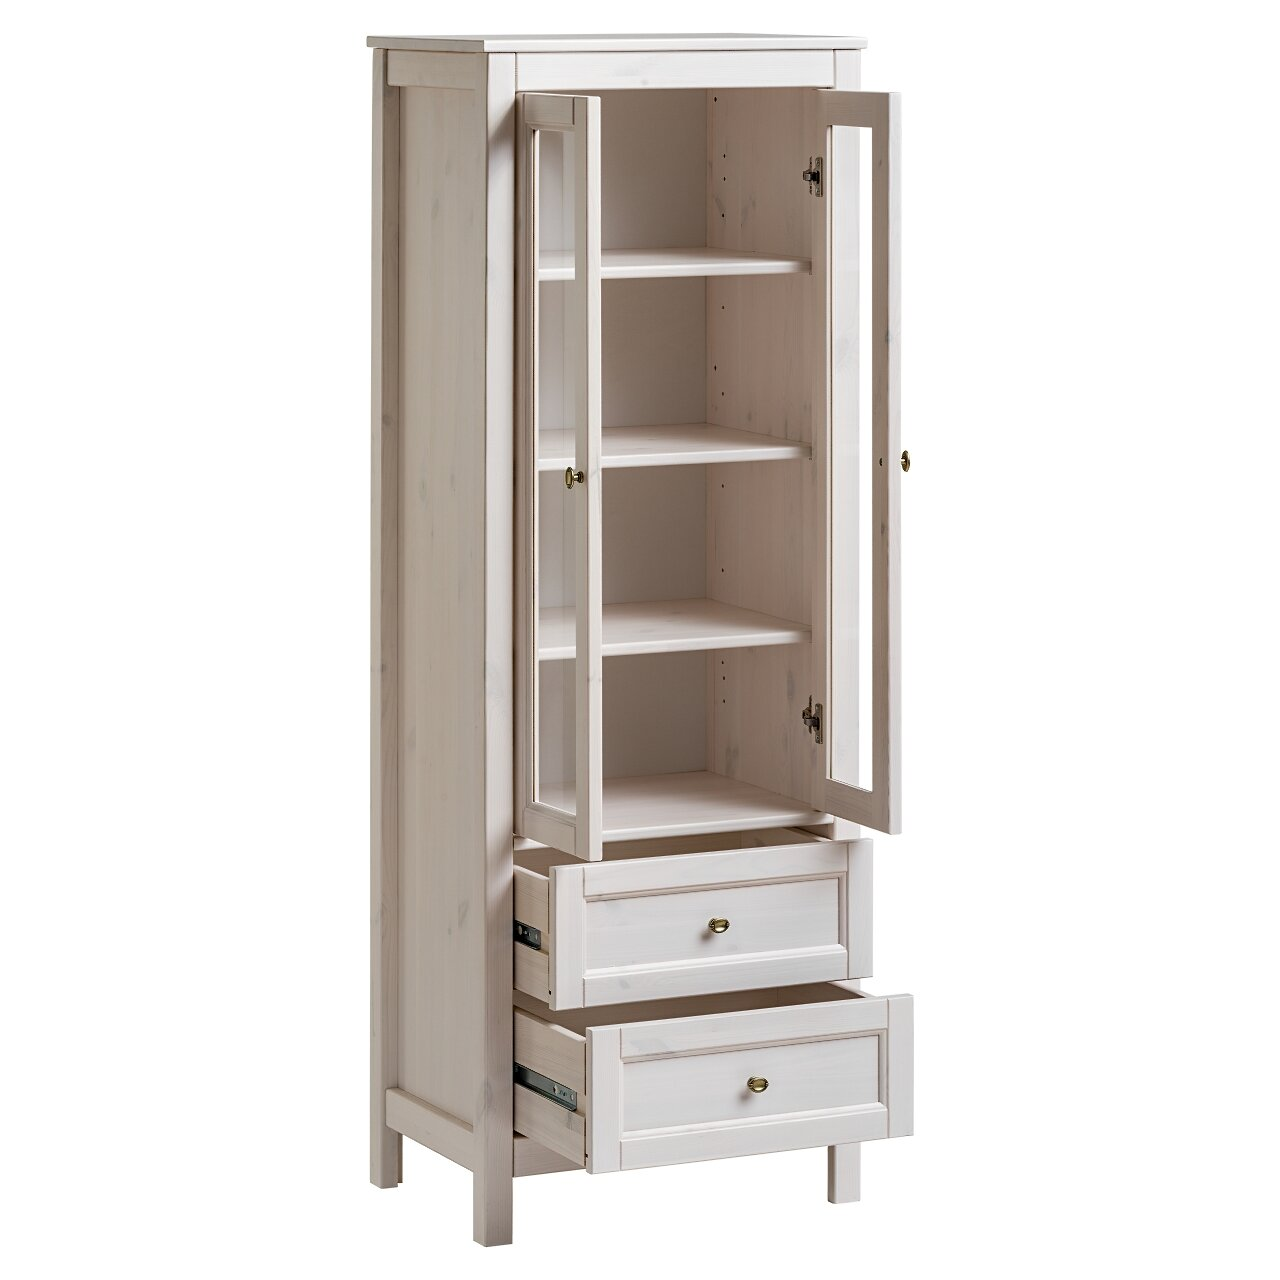 Belfry Bathroom Royal 55 X 155cm Free Standing Bathroom Cabinet